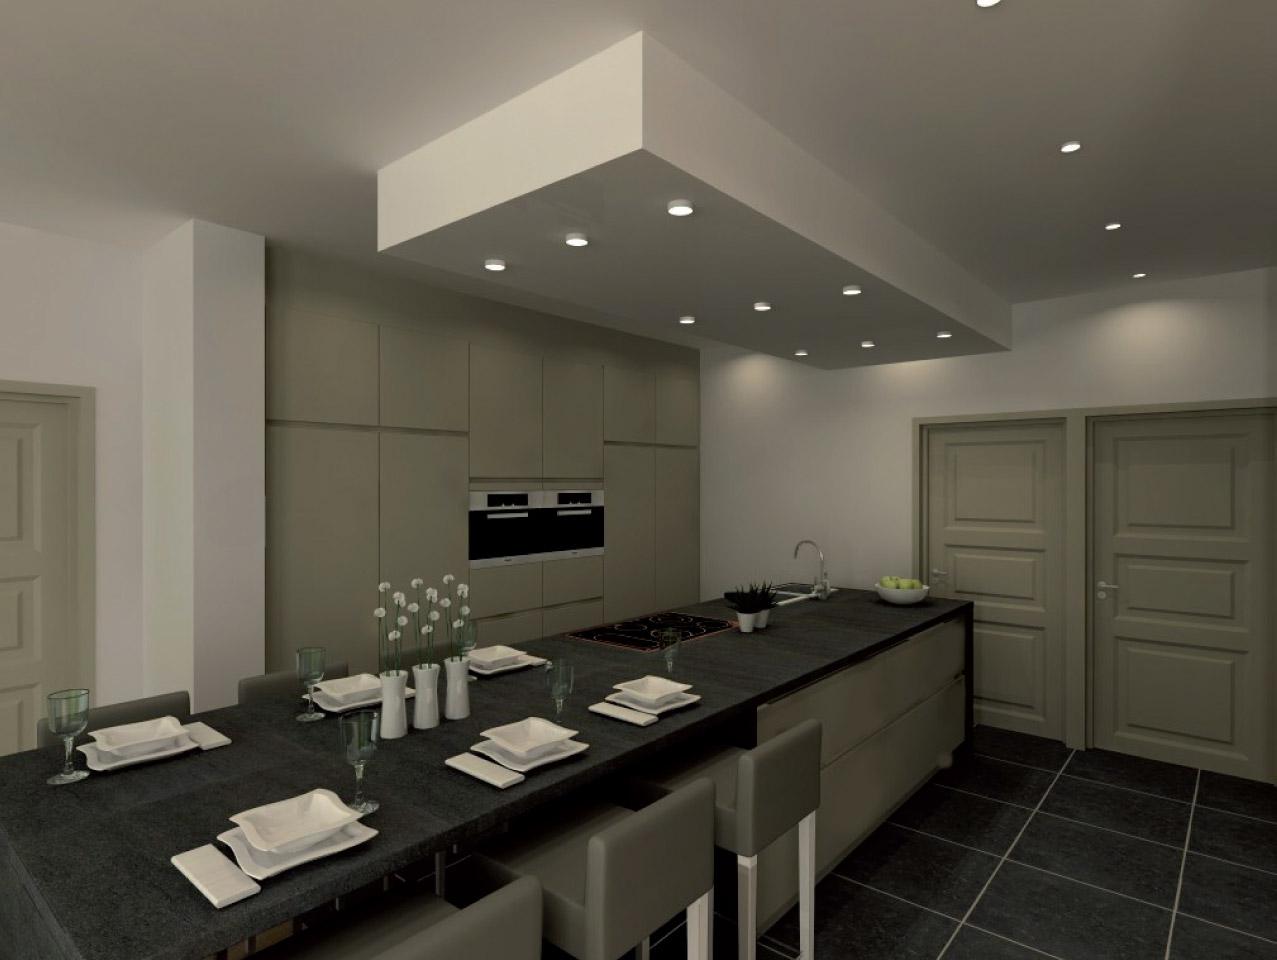 Aquizien hamme aanbod aan moderne keukens - Moderne keuken deco keuken ...